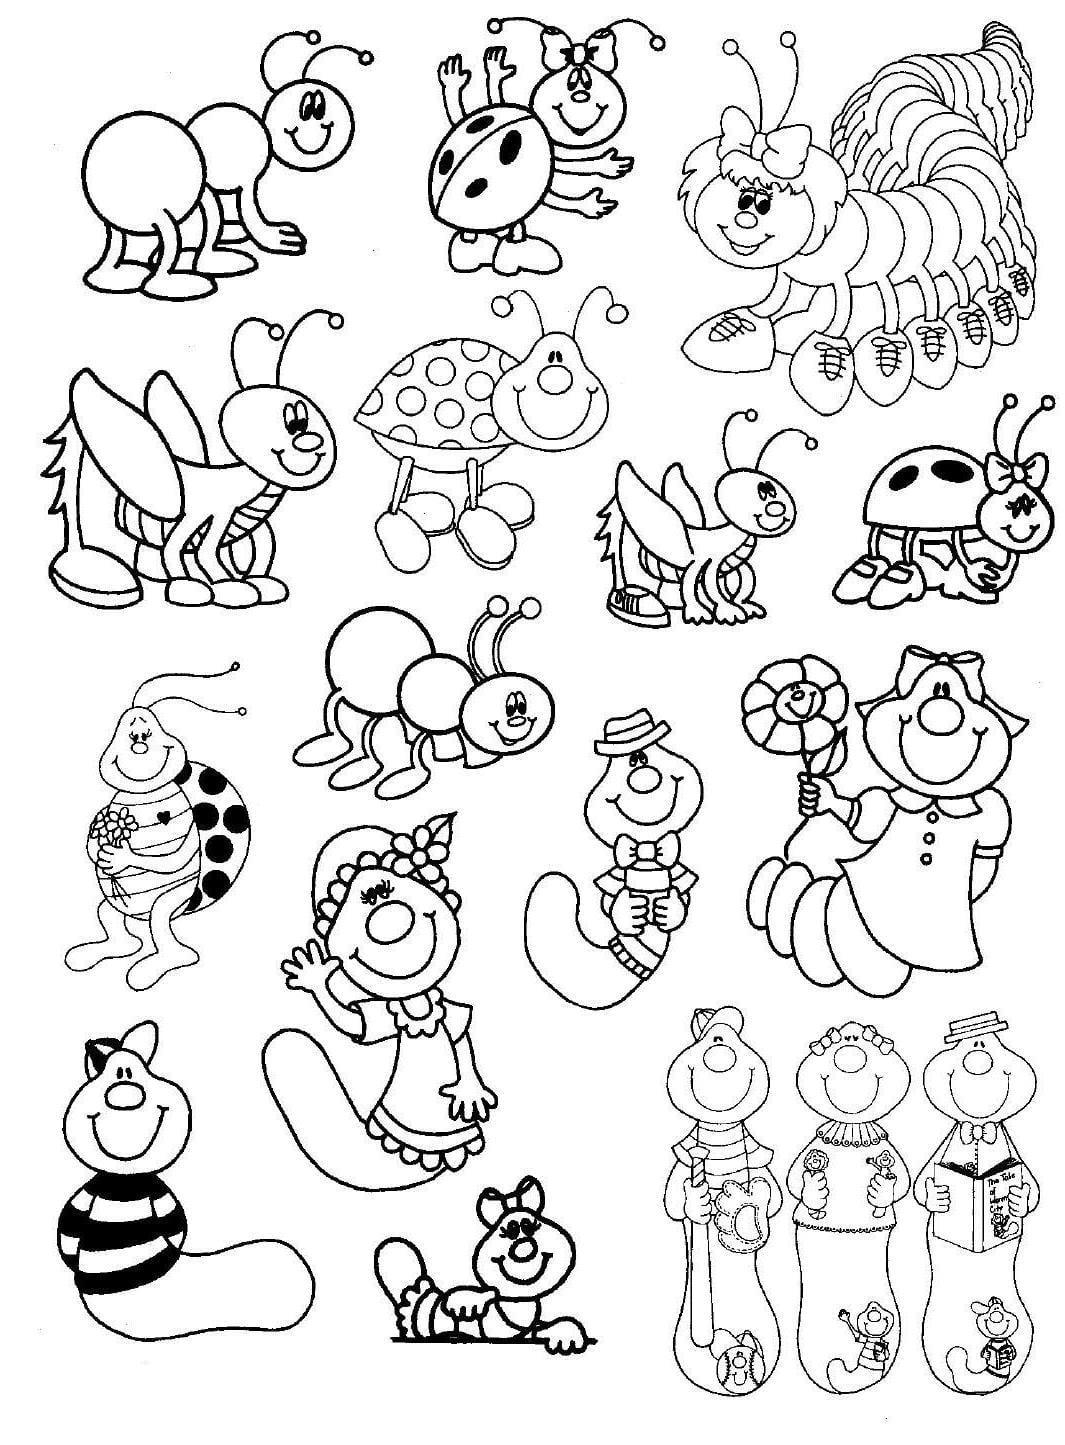 Desenhos_para_colorir_insetos_